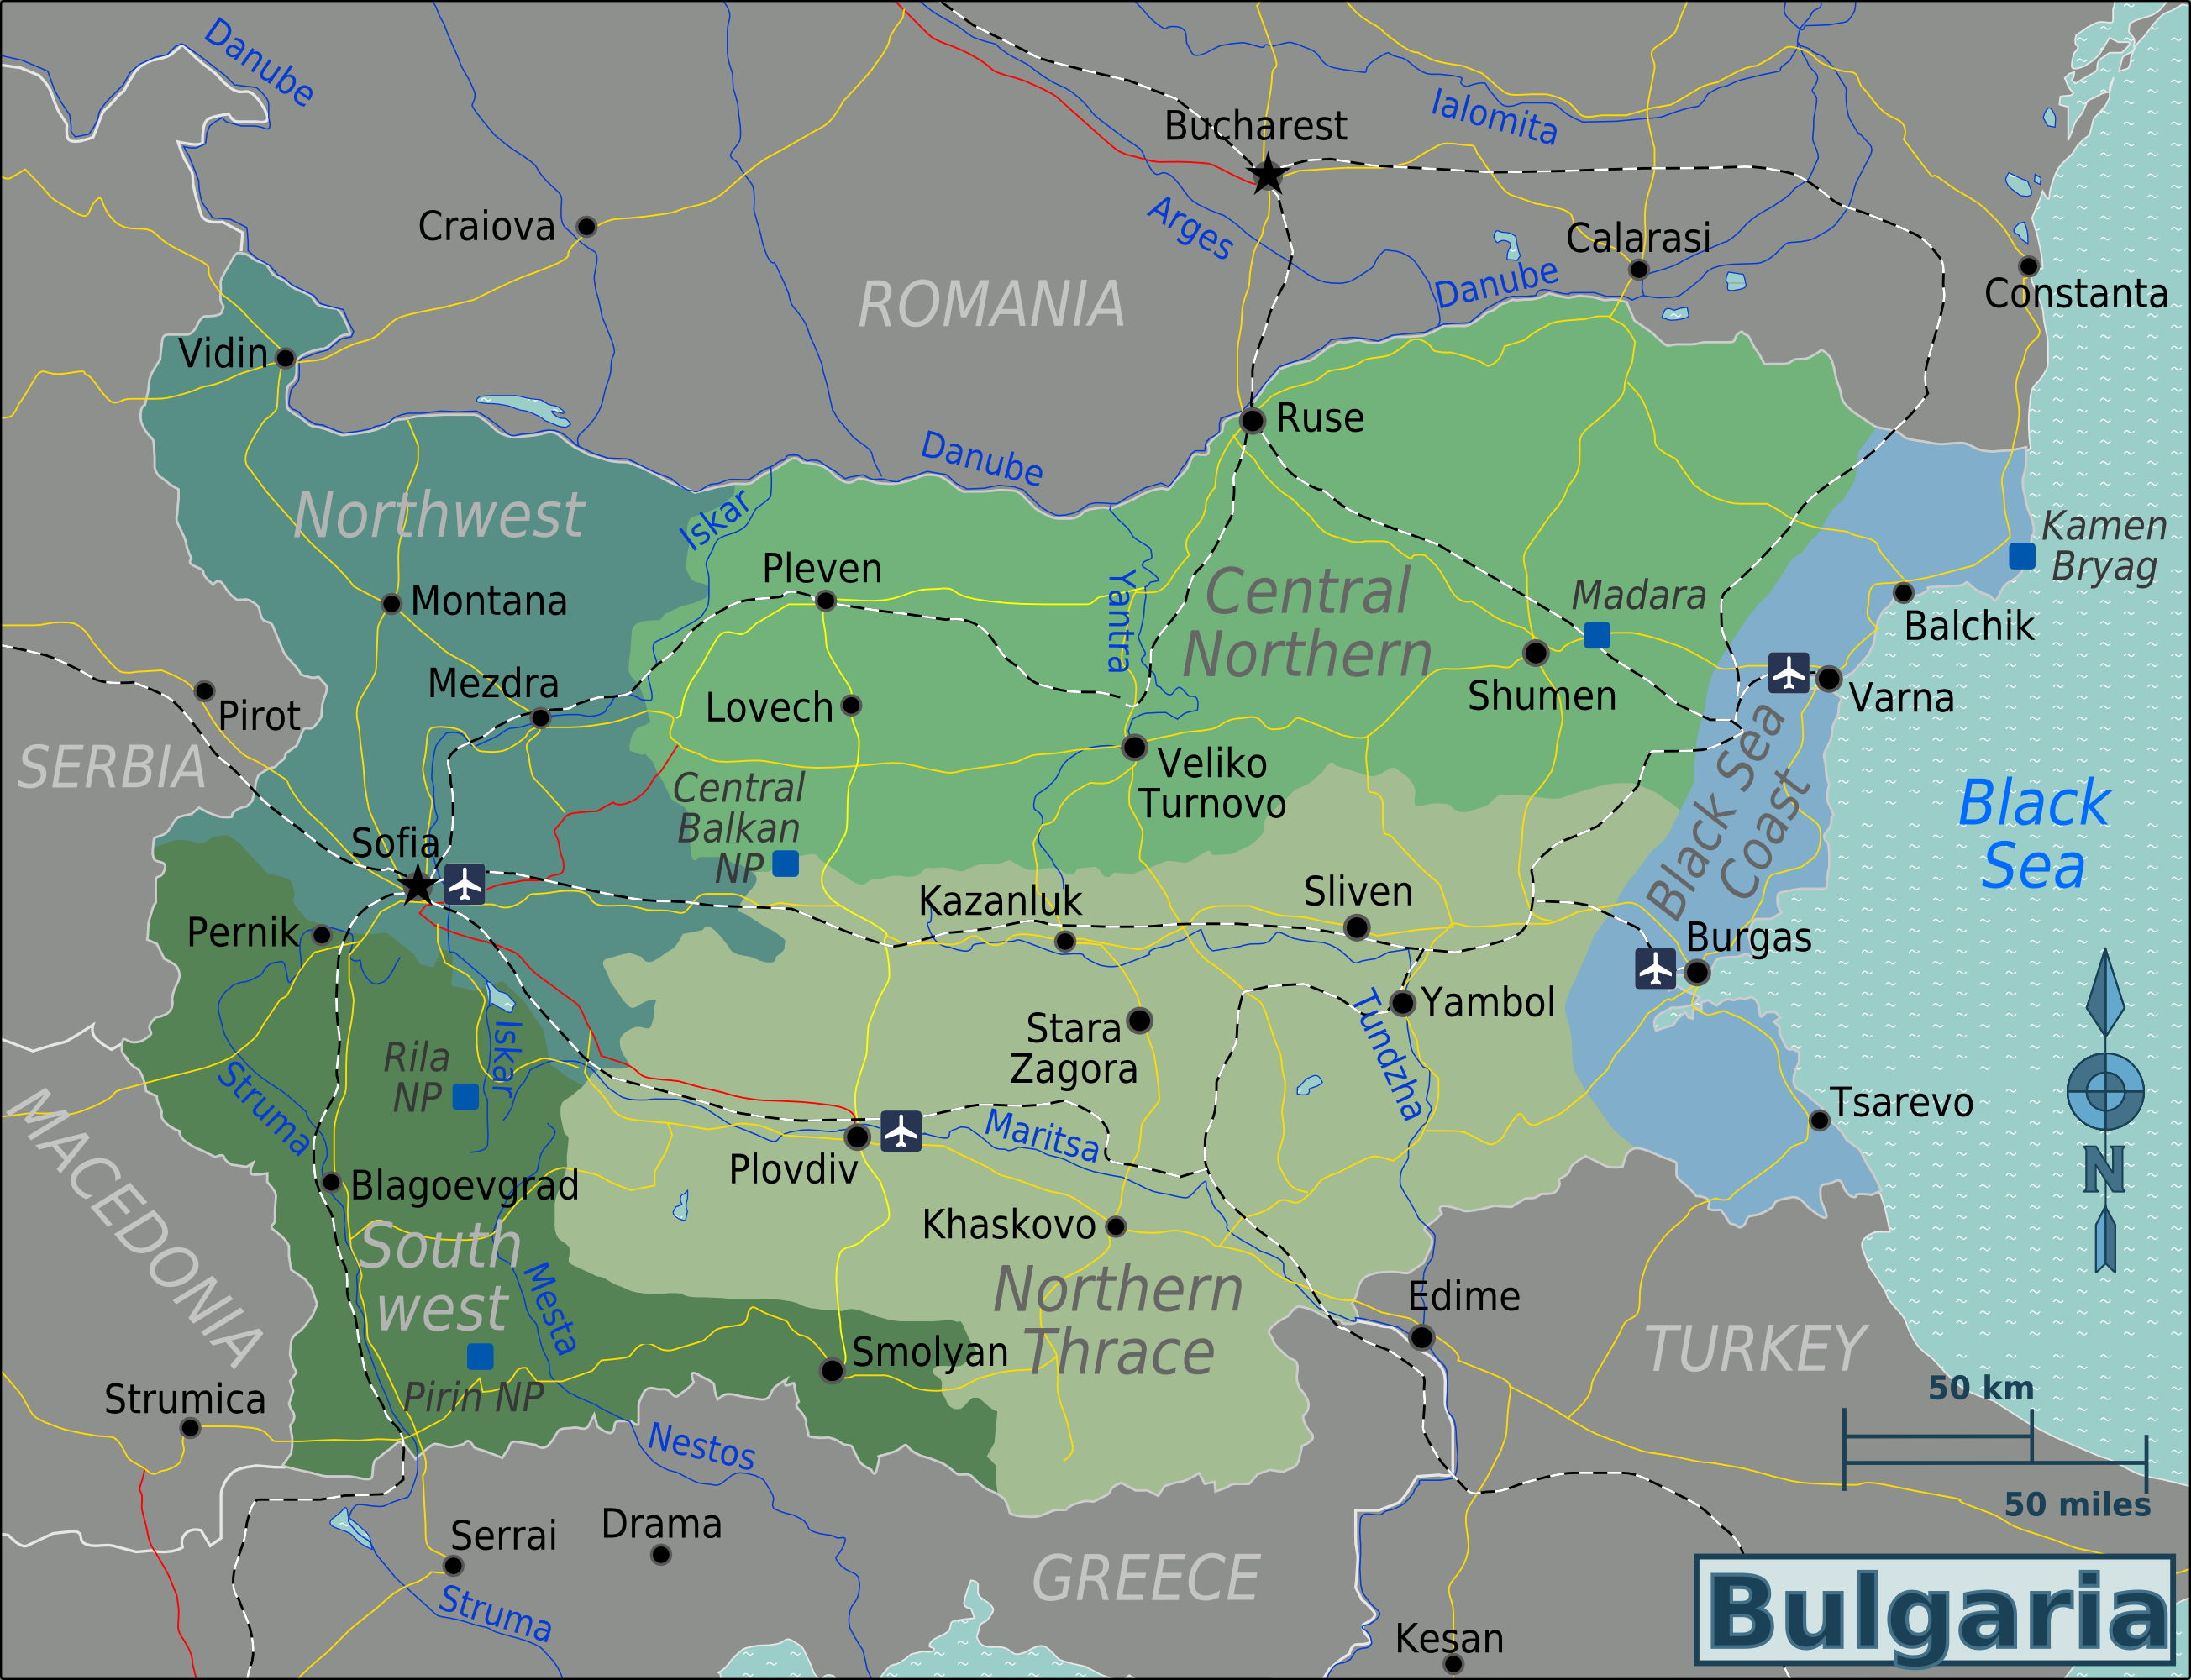 Bulgarien Karte Deutsch.Landkarte Bulgarien Karte Regionen Weltkarte Com